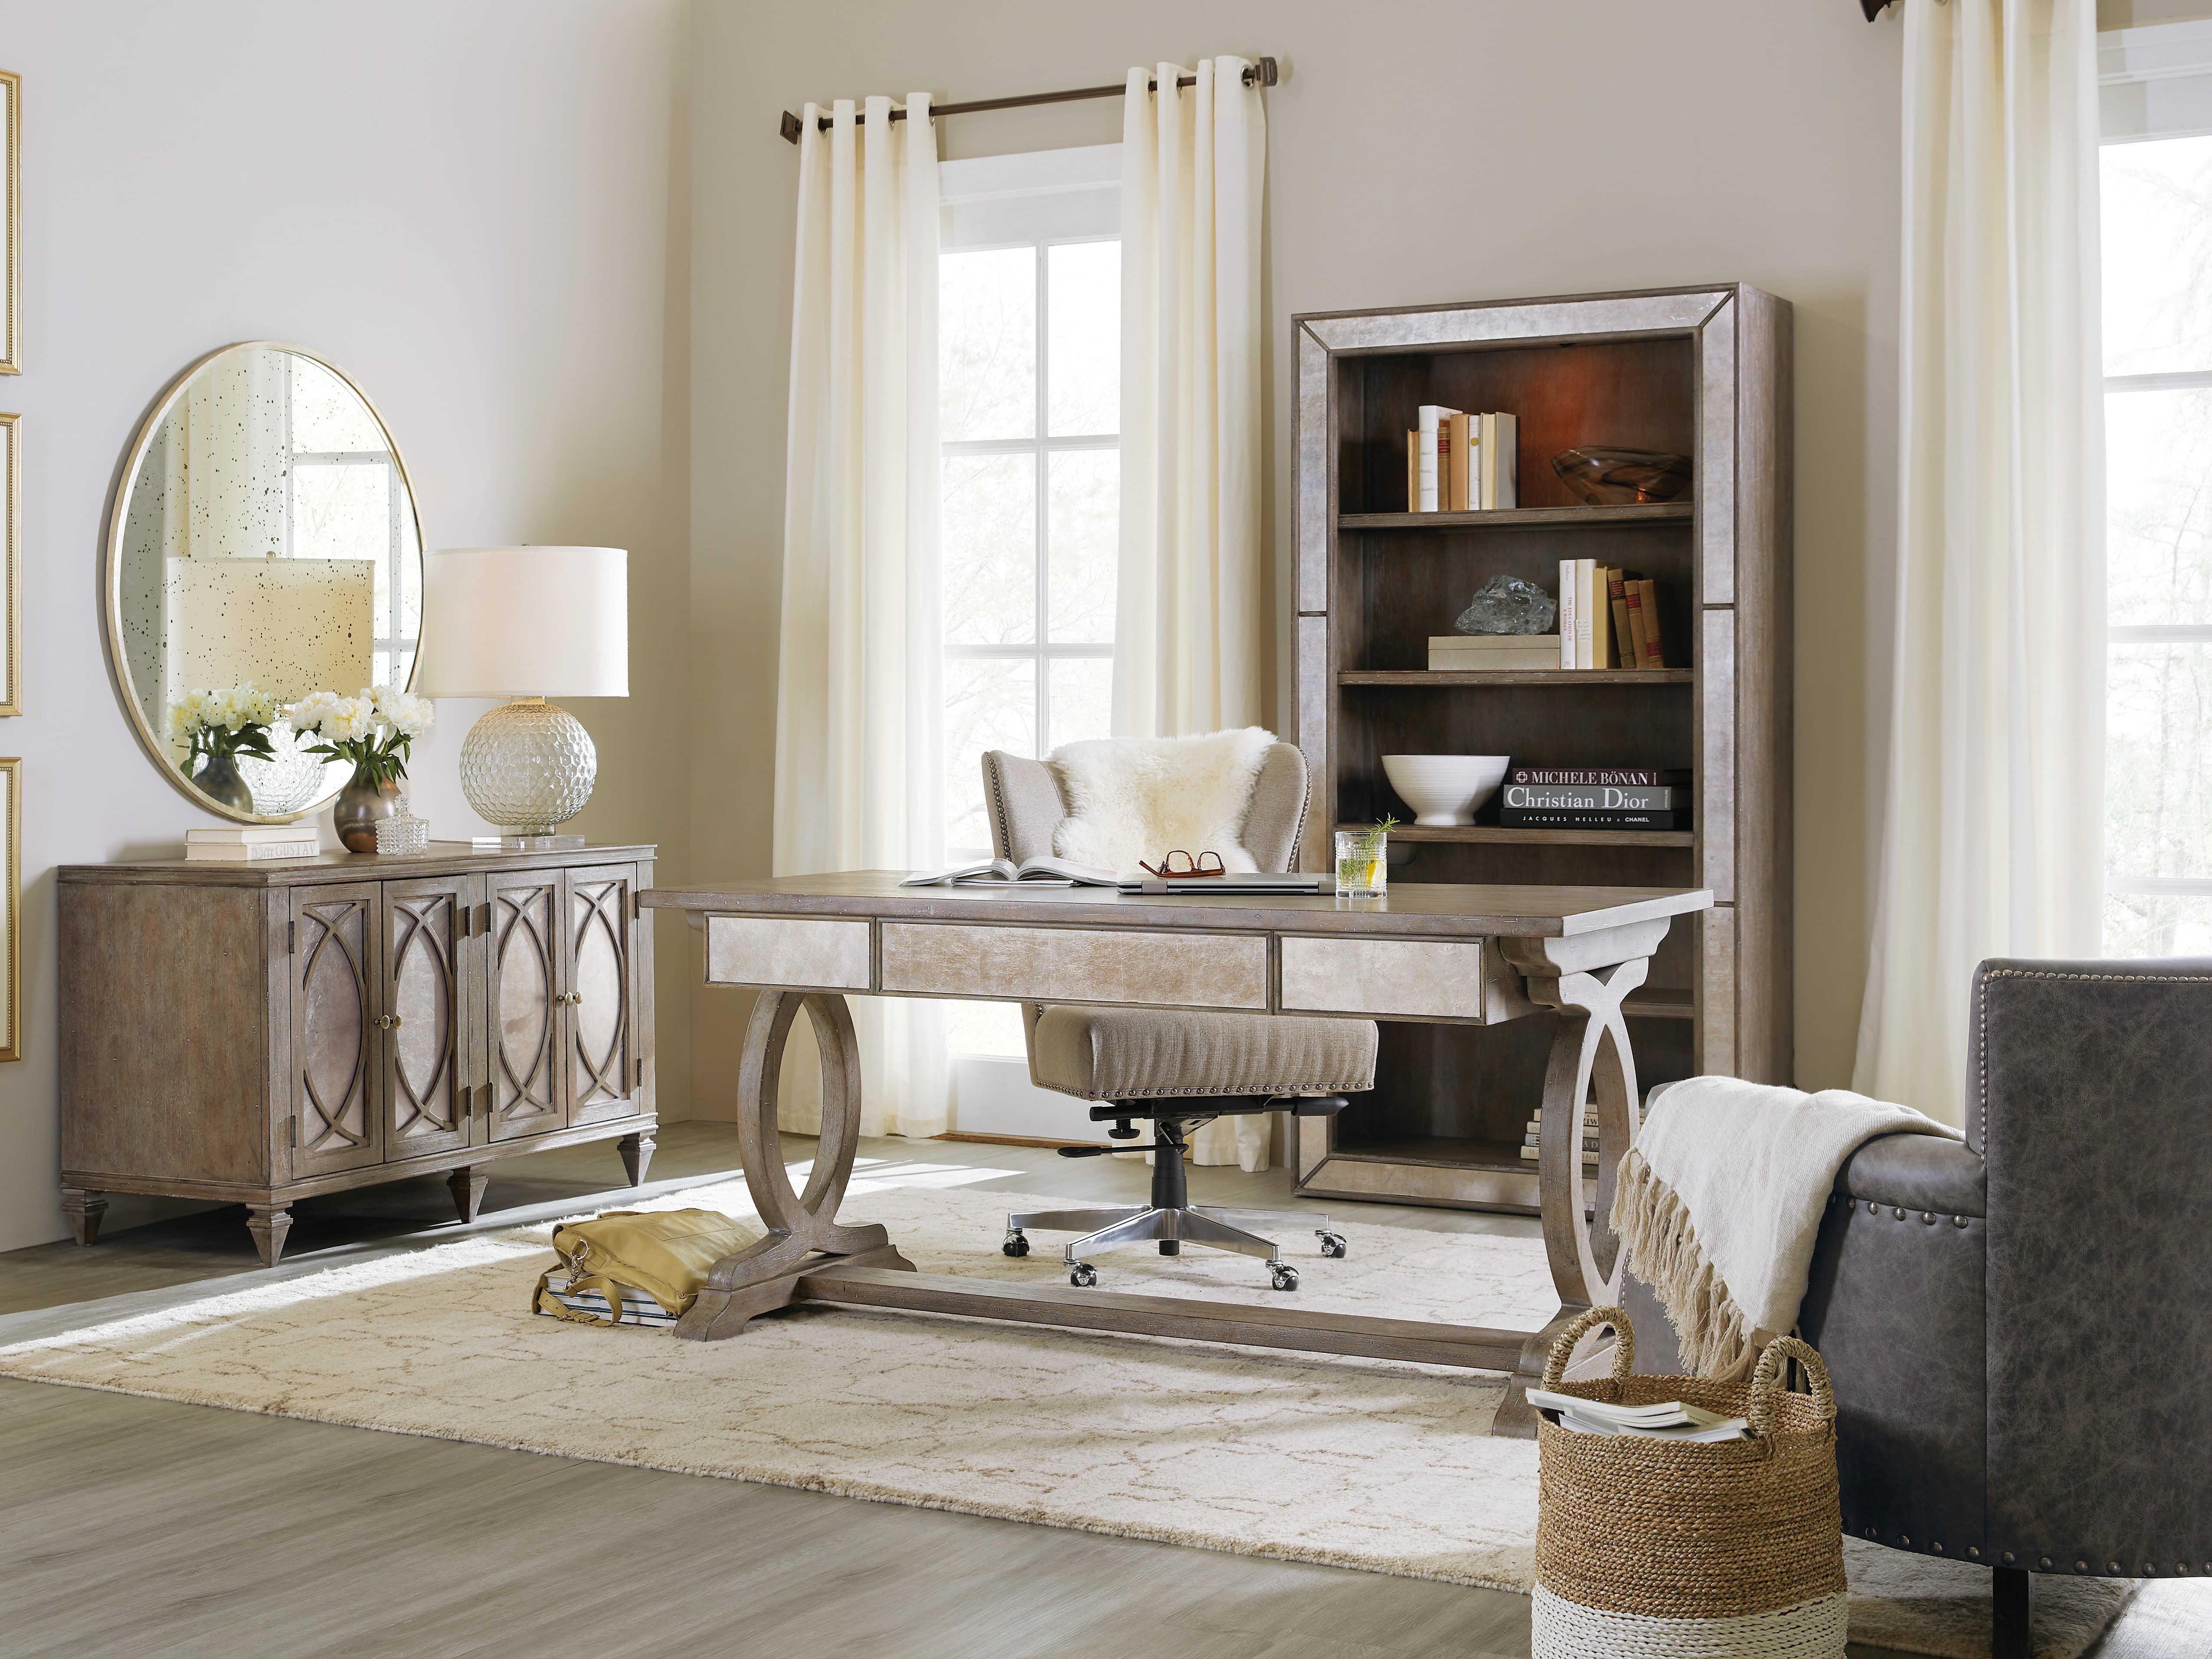 Hooker Furniture Rustic Glam Light Wood 64 L X 30 W